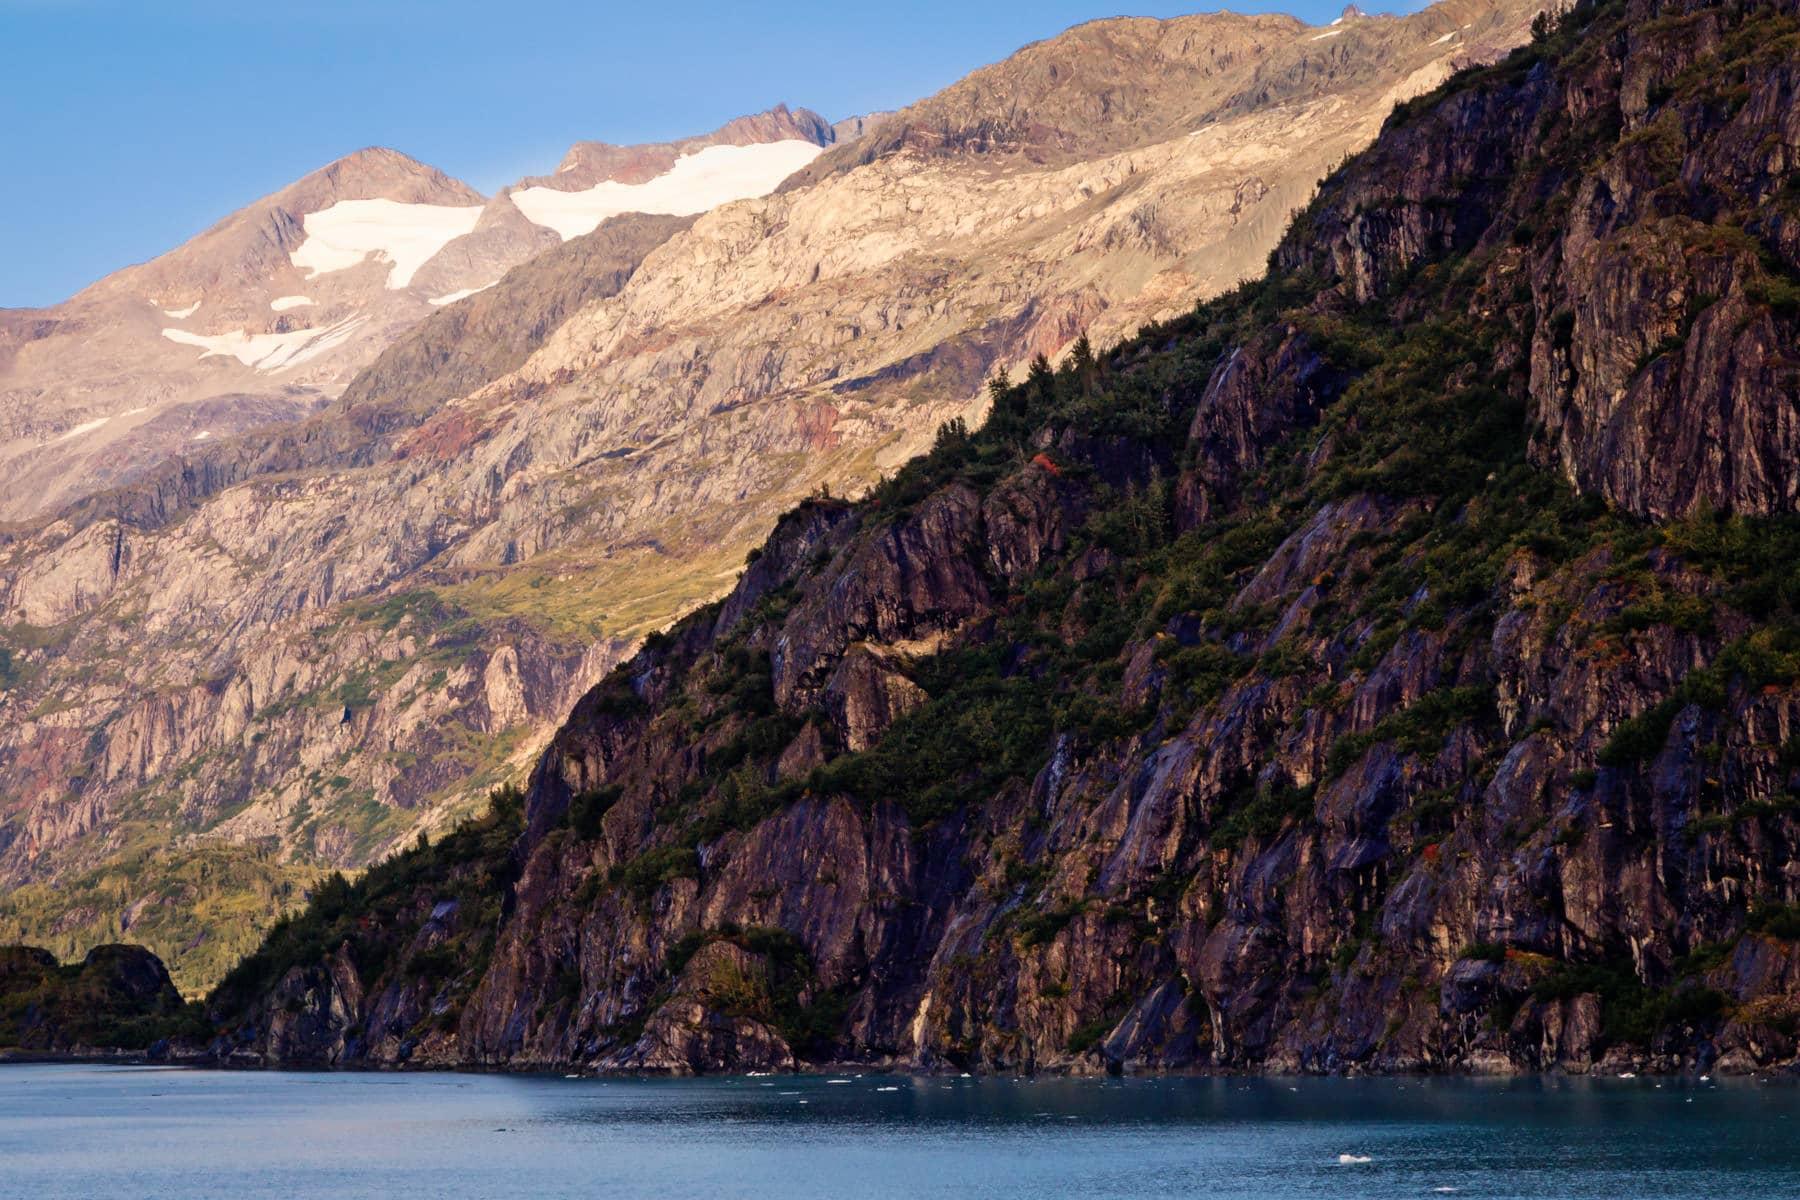 Mountains rise along the shore of Alaska's Glacier Bay.